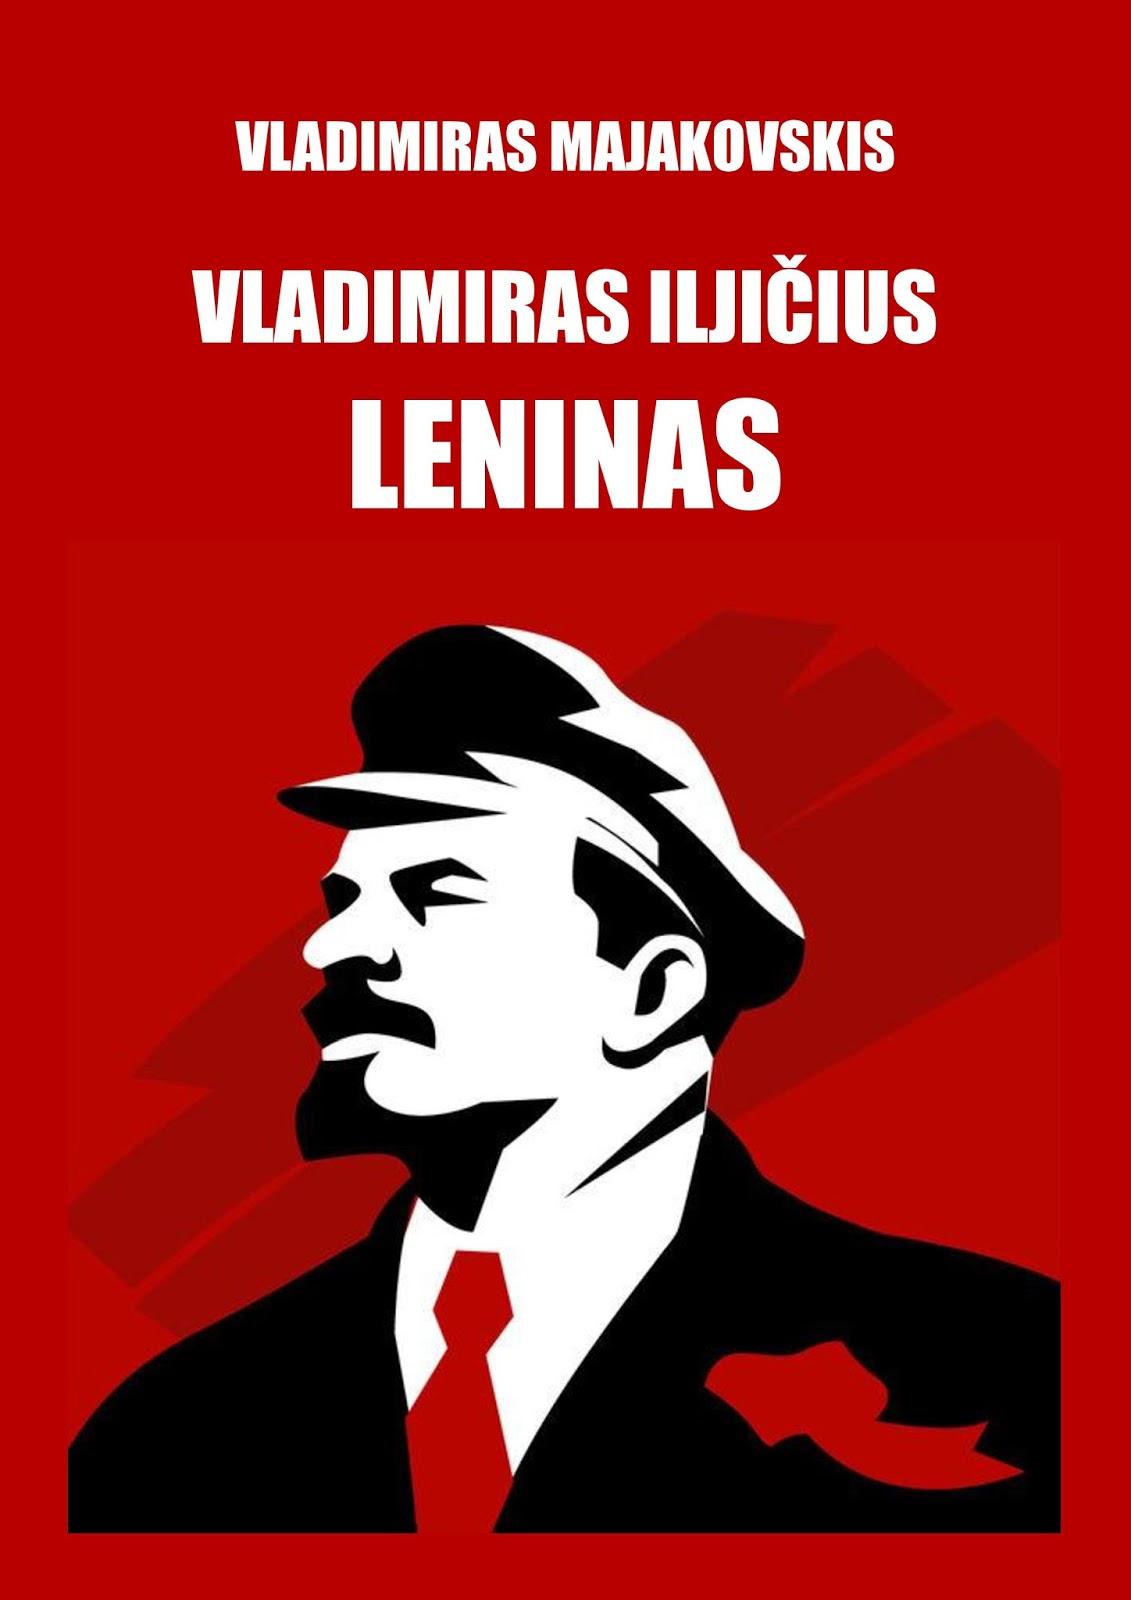 vi_leninas_poema_virselis.jpg